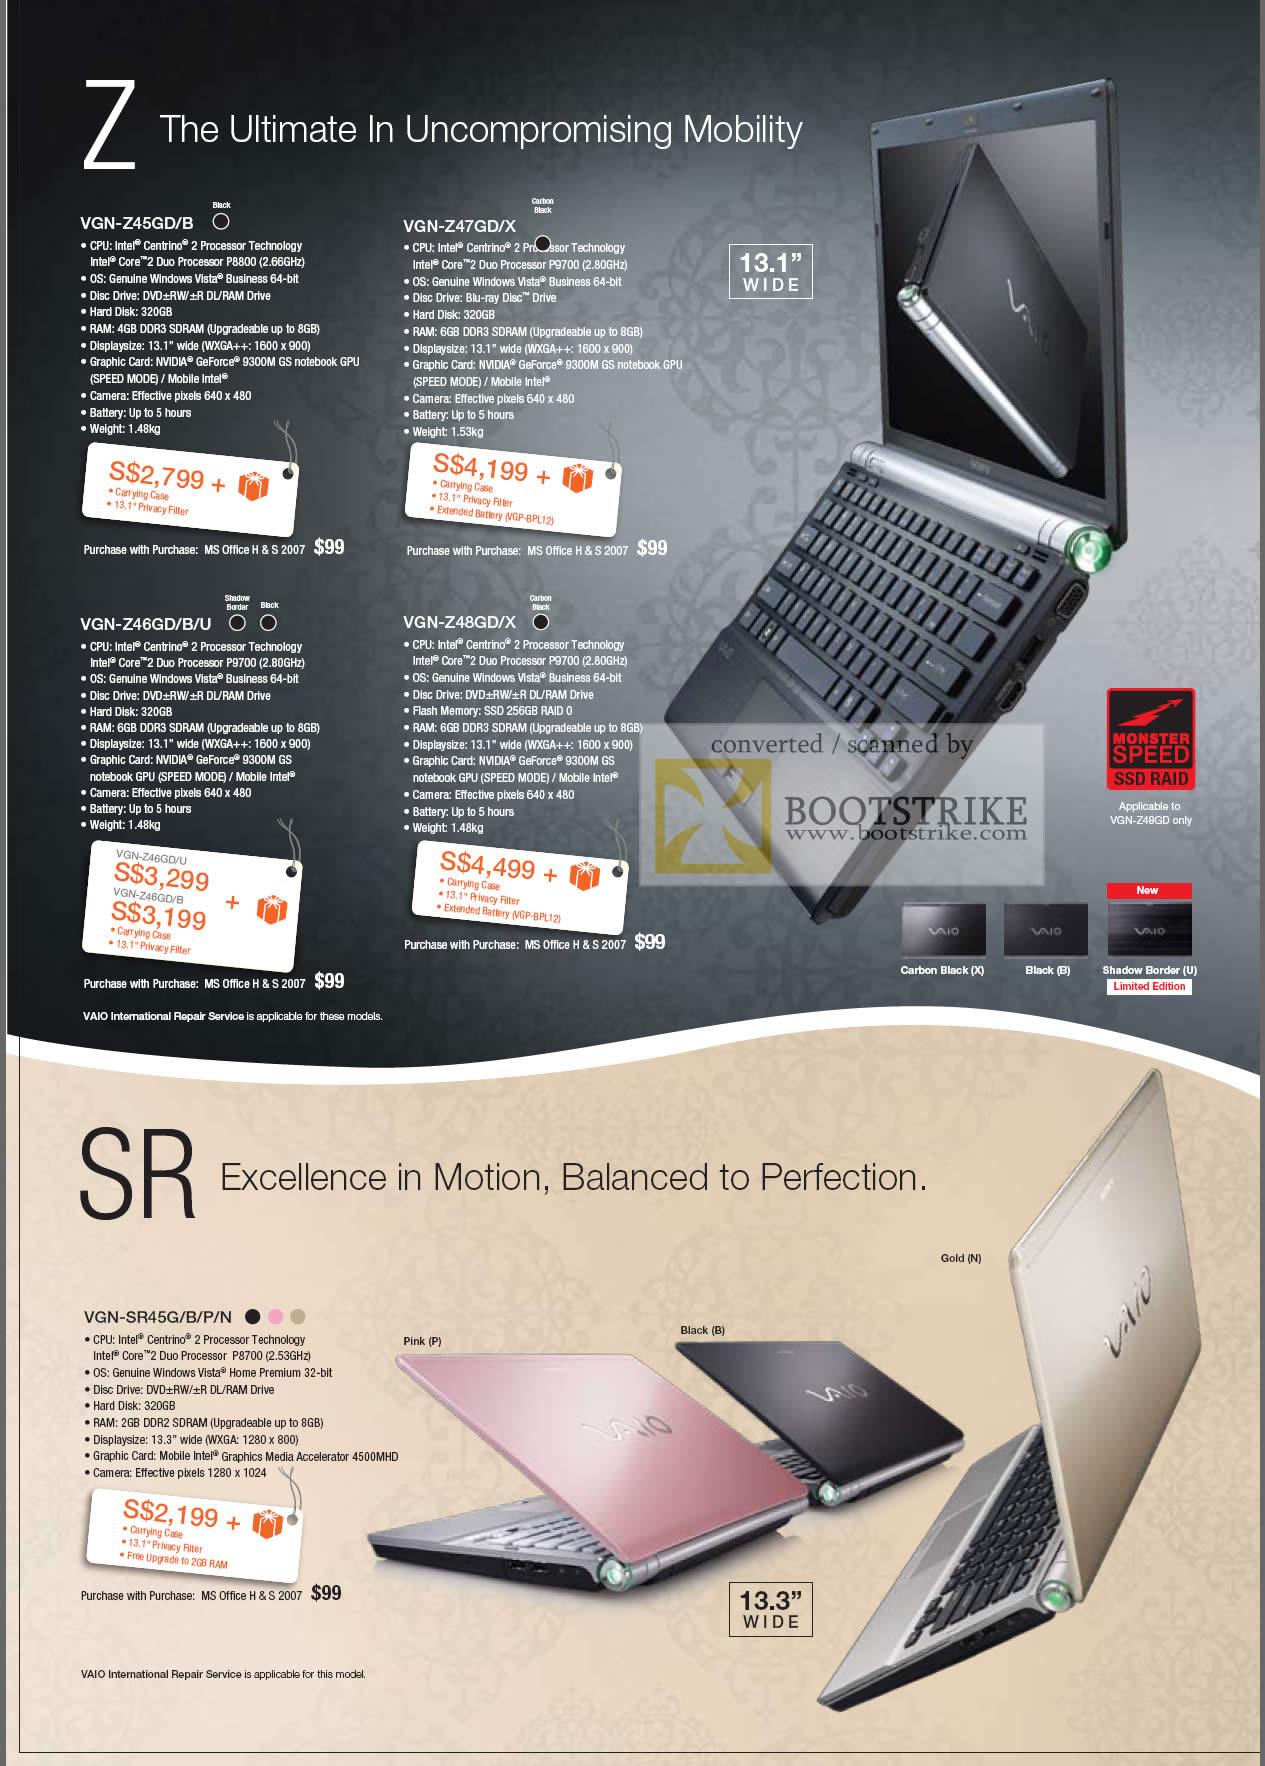 Comex 2009 price list image brochure of Sony Vaio Z Z45GD Z47GD Z46GD Z48GD SR VGN SR45G